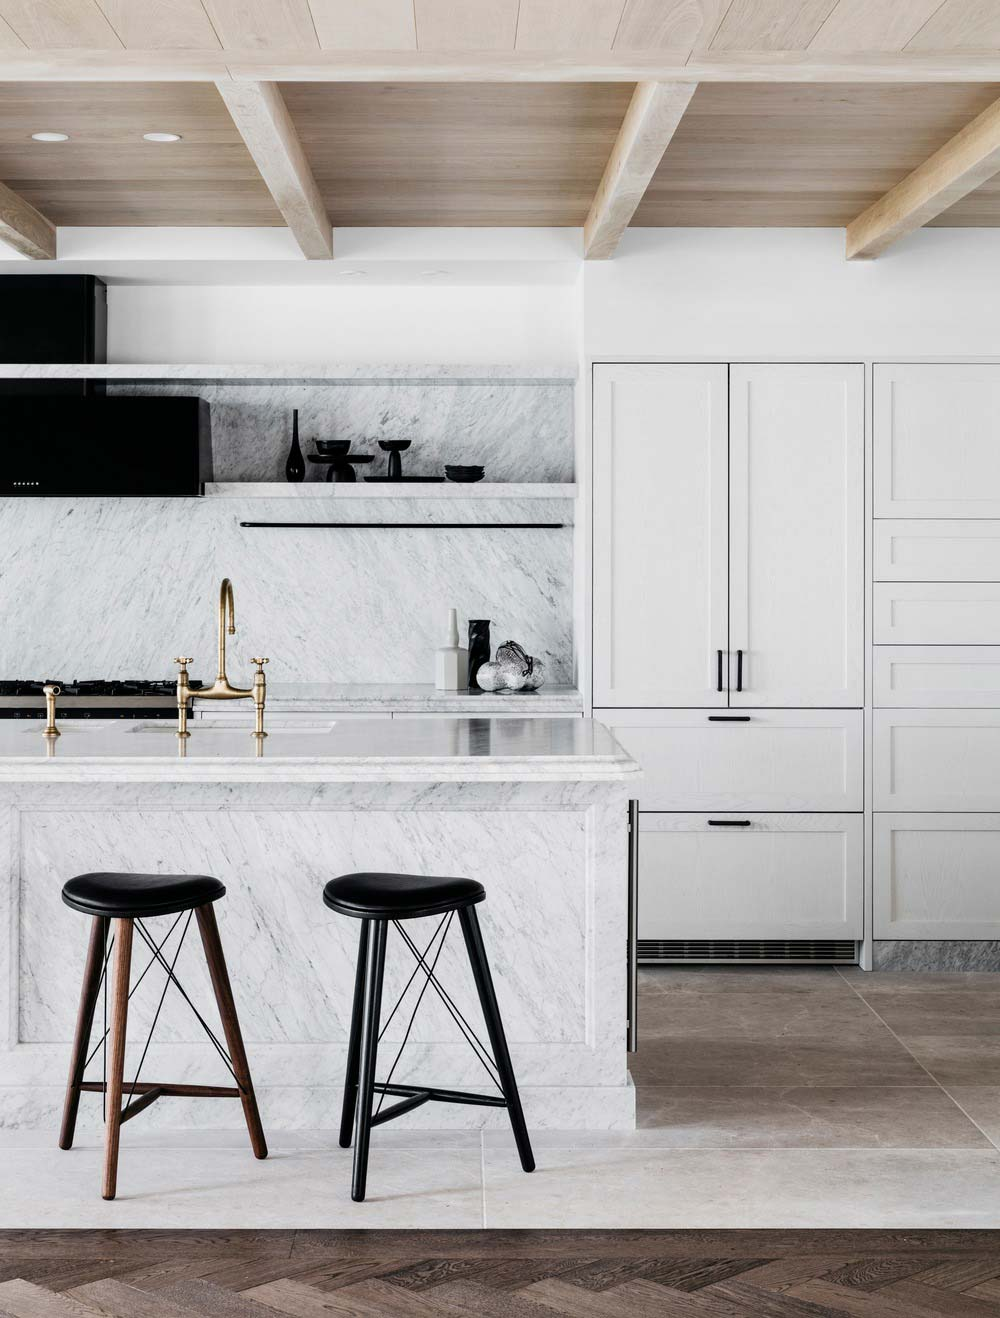 waterfront holiday villa kitchen island design - Palm Beach Project